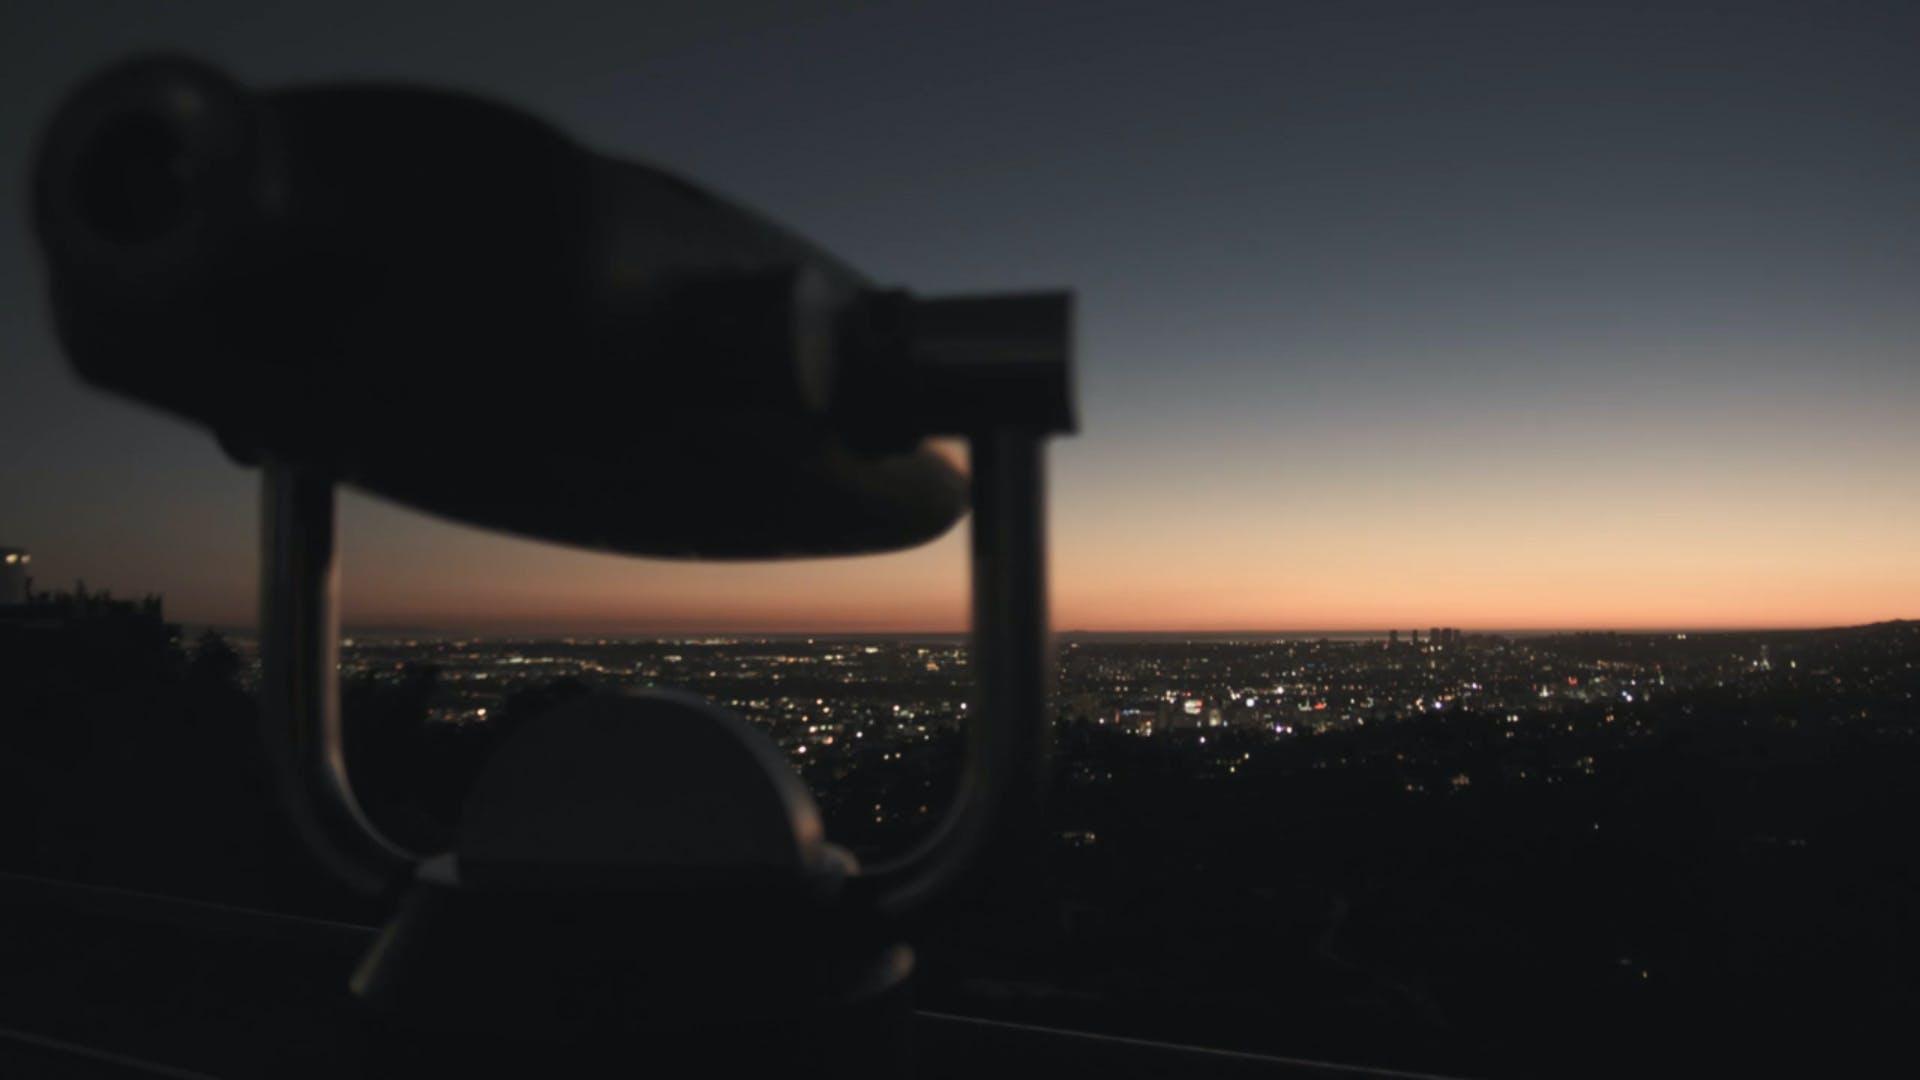 city lights, city view, dawn